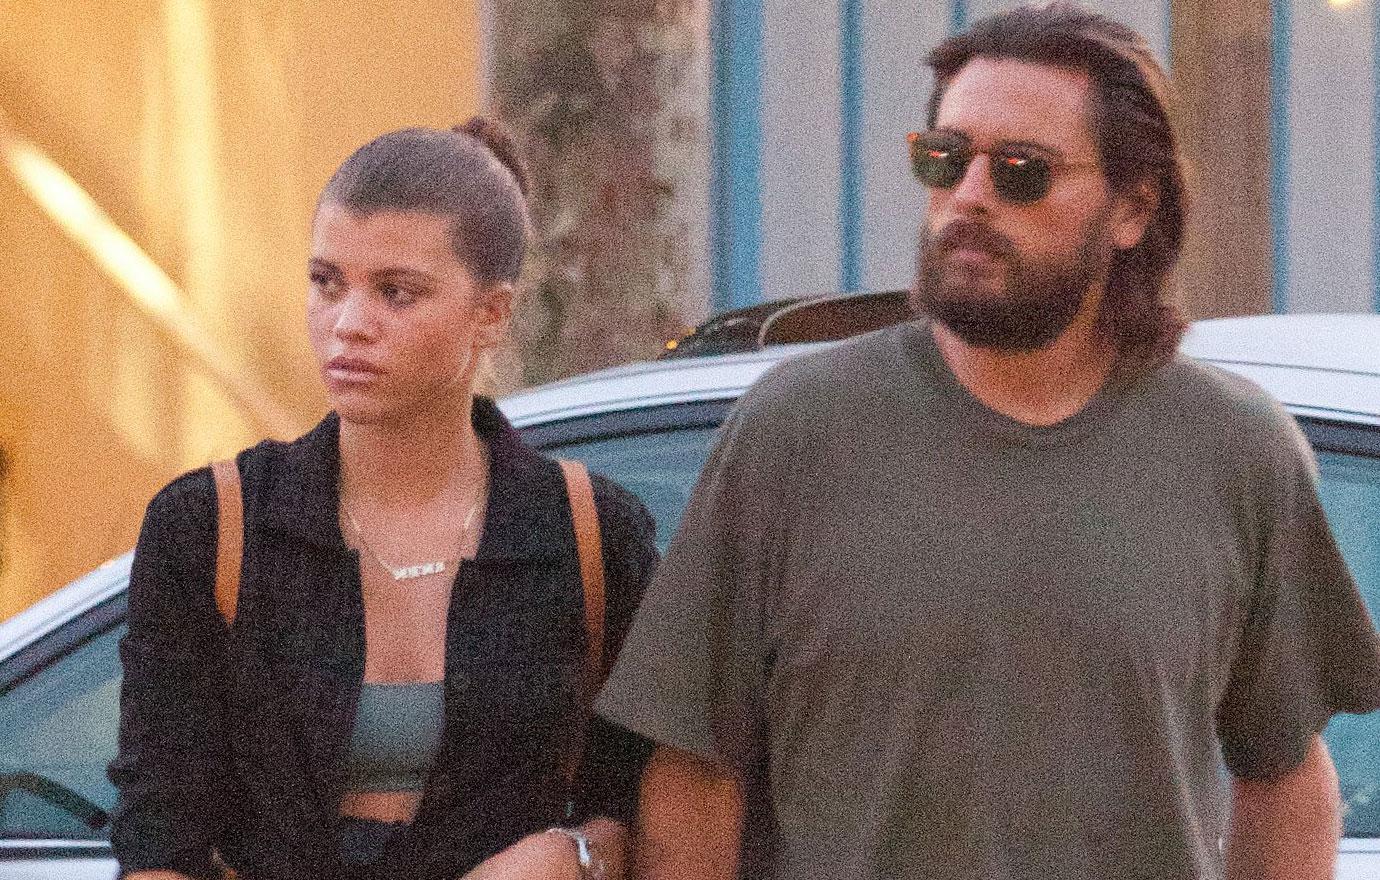 Scott Disick And Sofia Richie Have Romantic Malibu Date